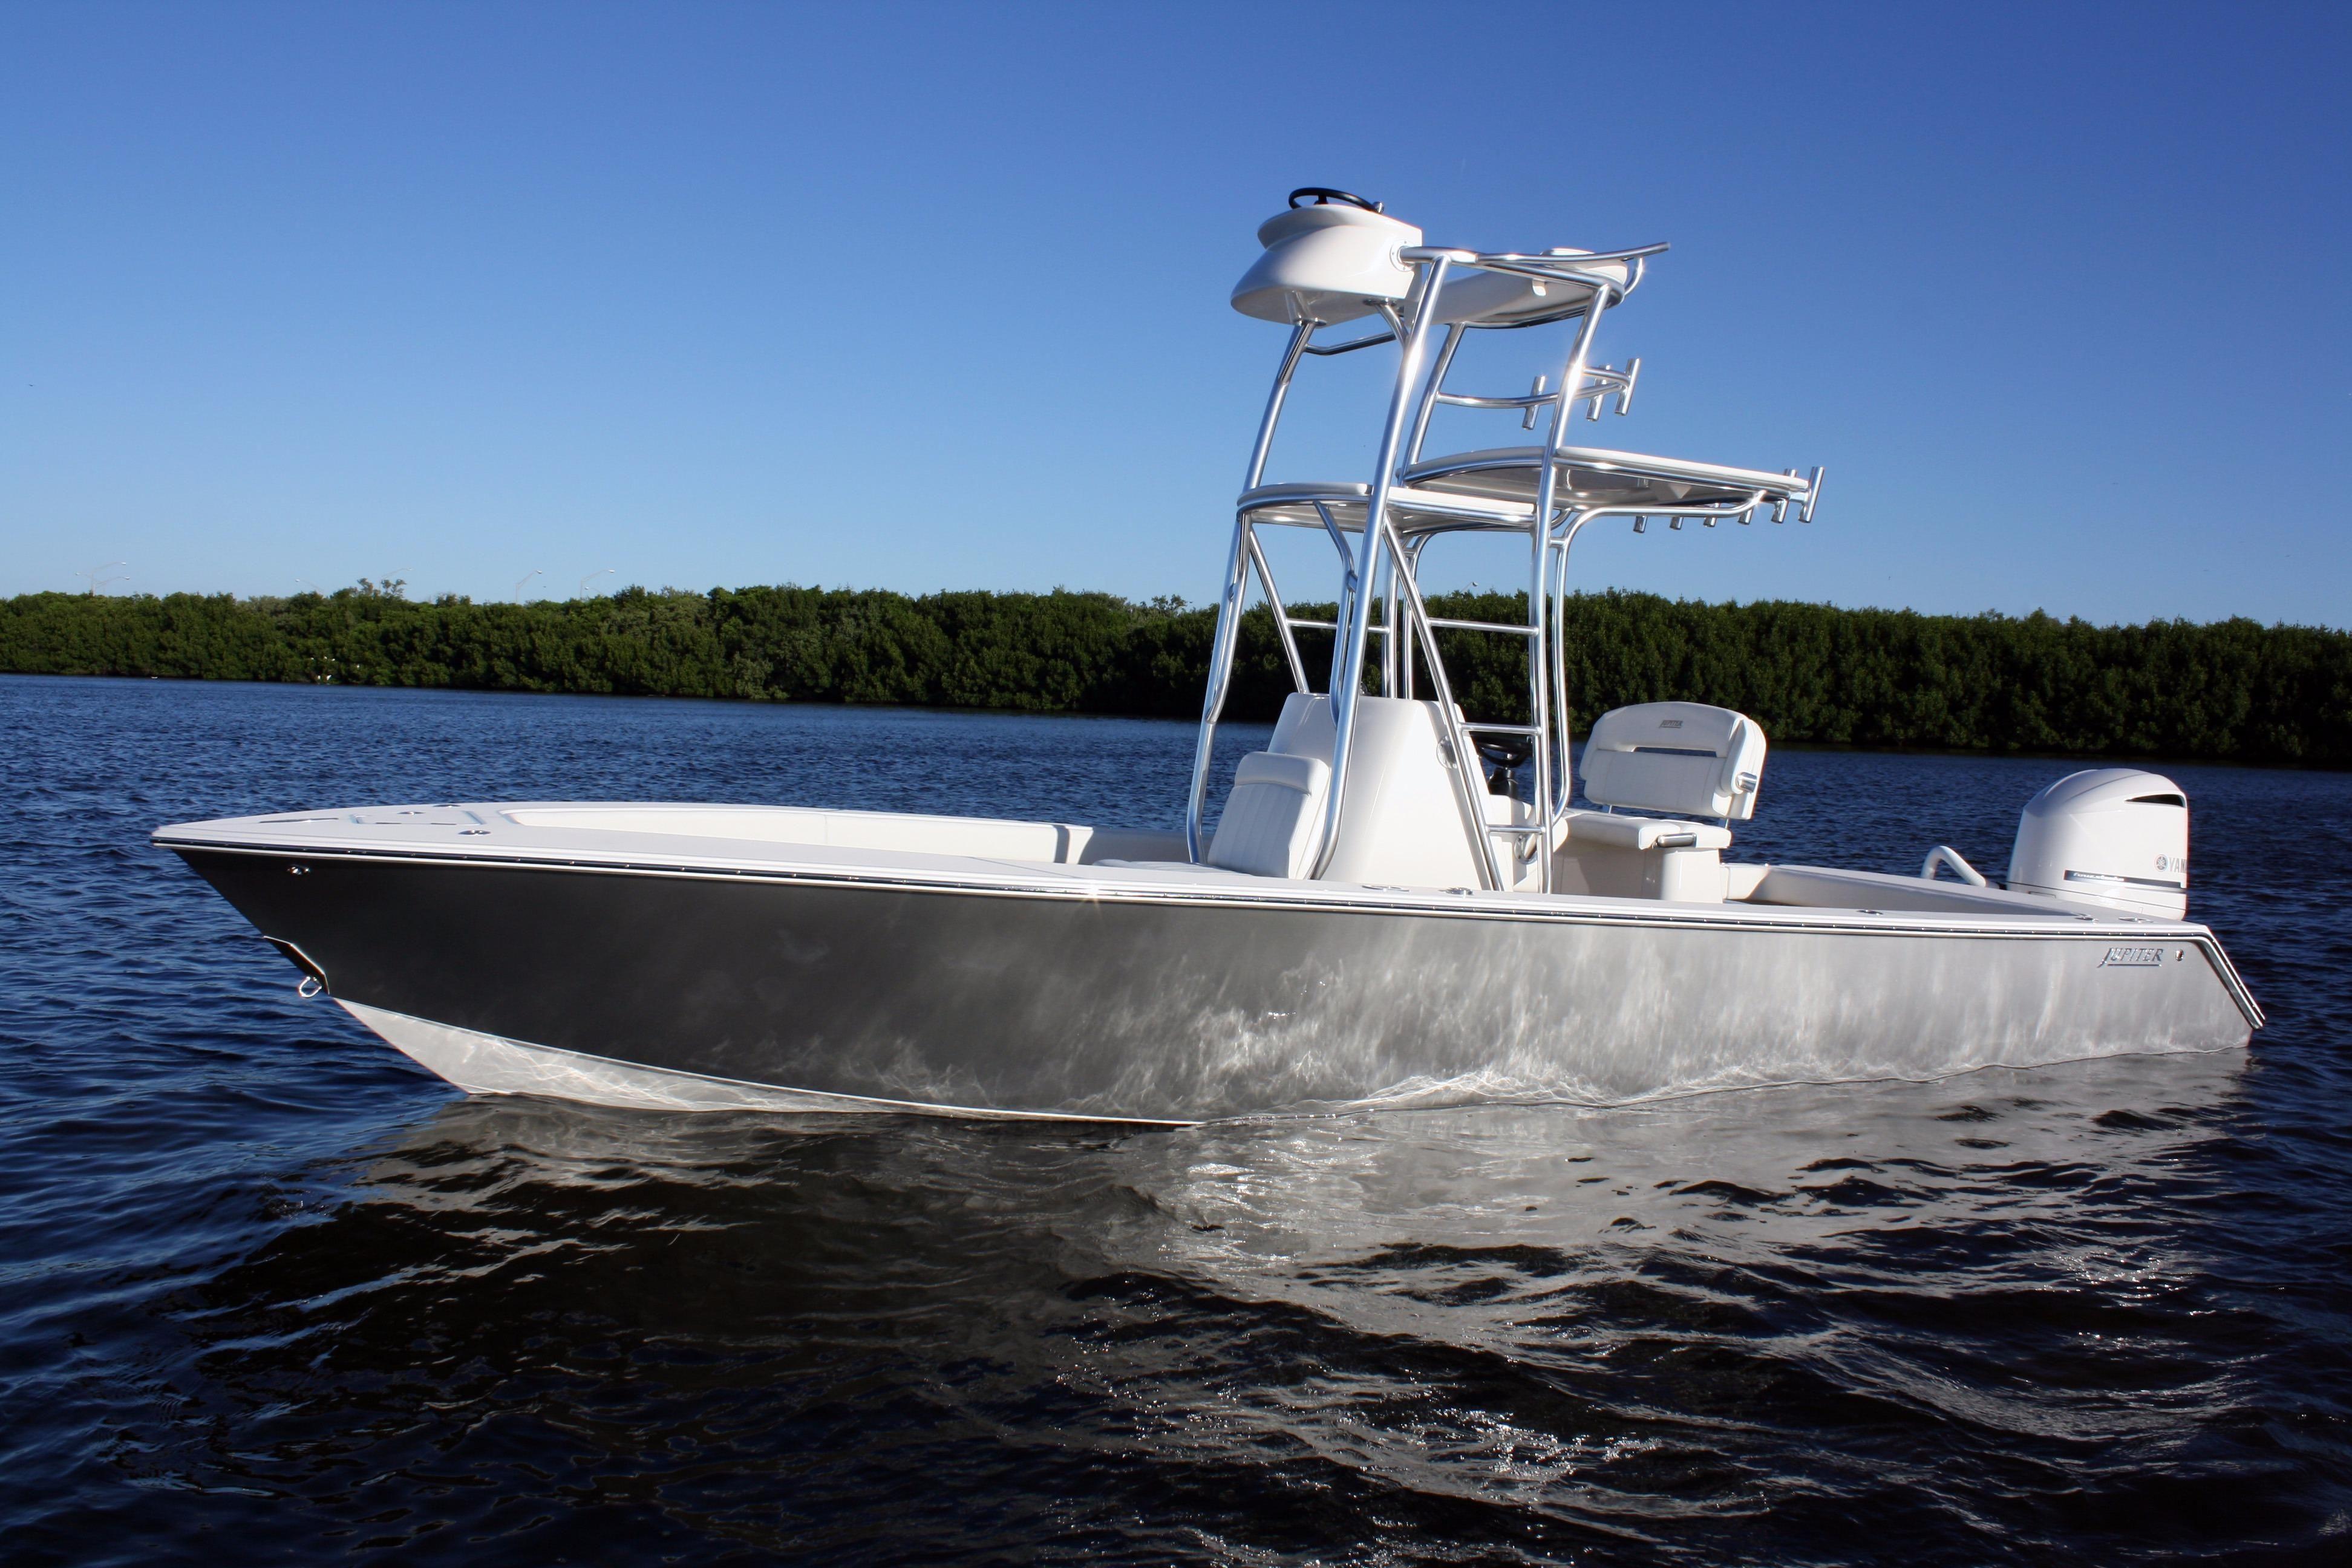 2018 Jupiter 25 Bay Power Boat For Sale - www.yachtworld.com